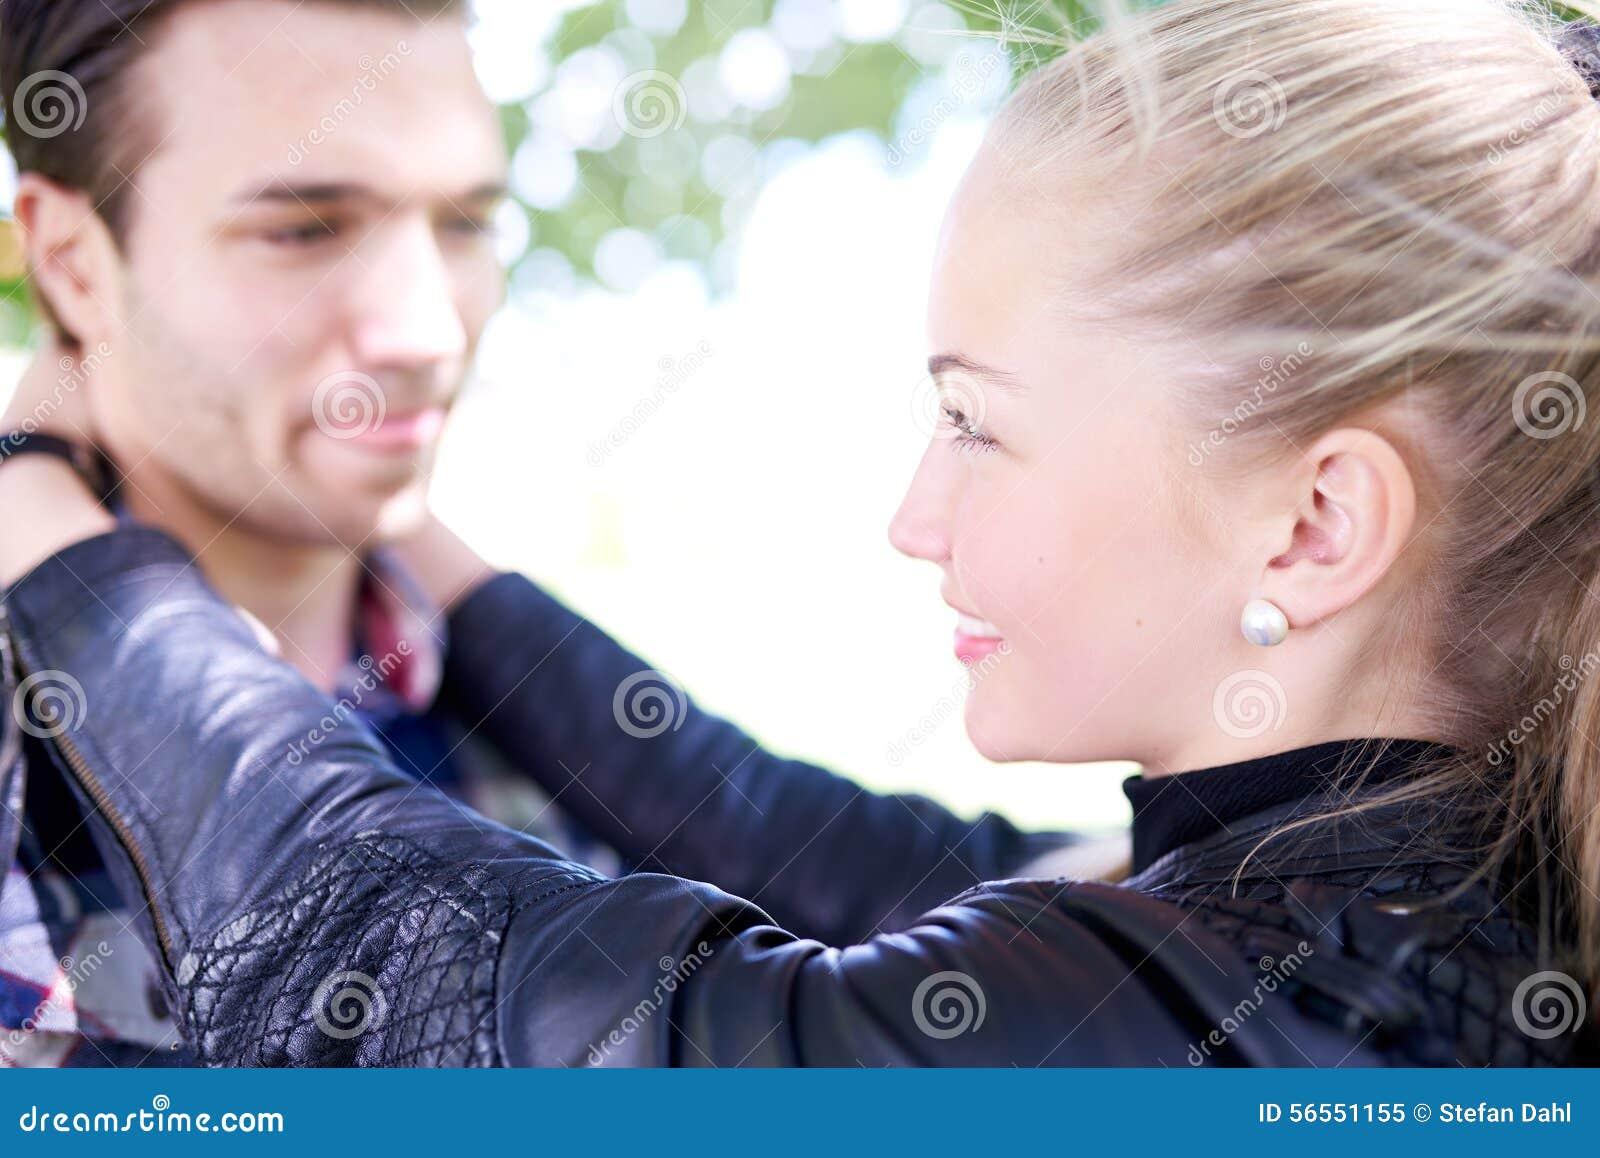 Download Κλείστε επάνω τους γλυκούς νέους εραστές που χαμογελούν ο ένας στον άλλο Στοκ Εικόνα - εικόνα από συγκίνηση, σύντροφοι: 56551155